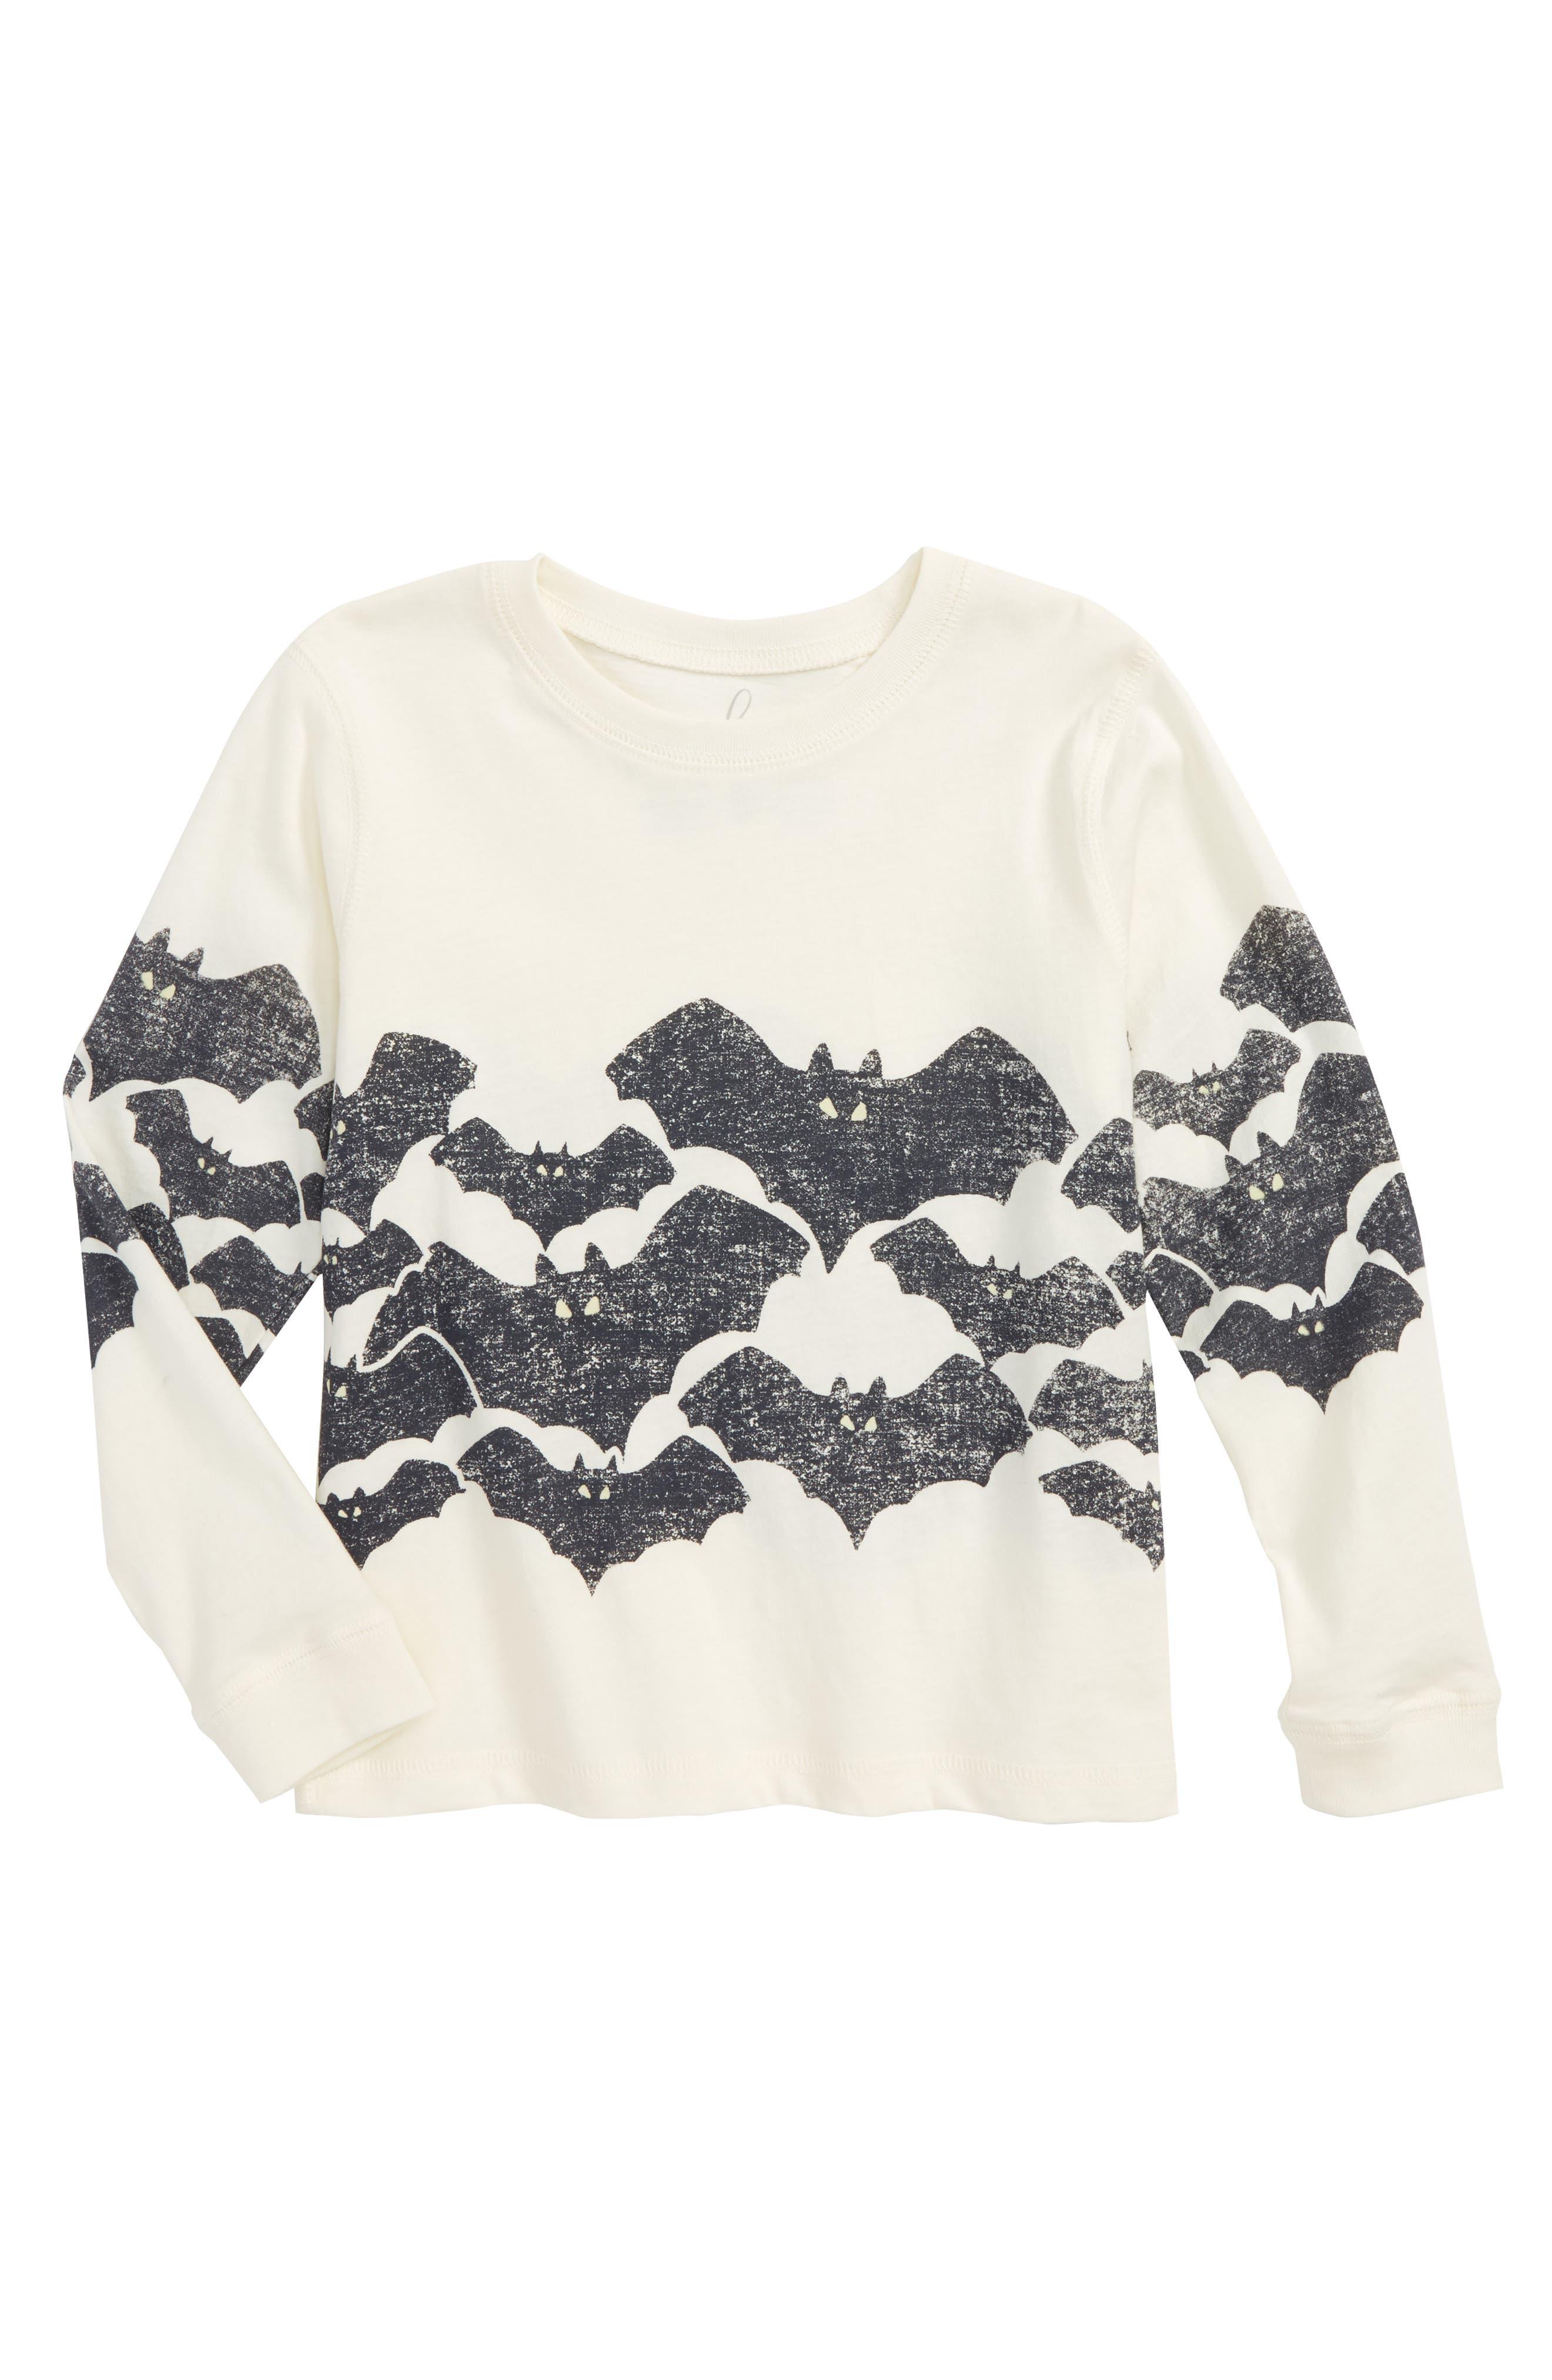 Bats Glow in the Dark T-Shirt,                             Main thumbnail 1, color,                             900